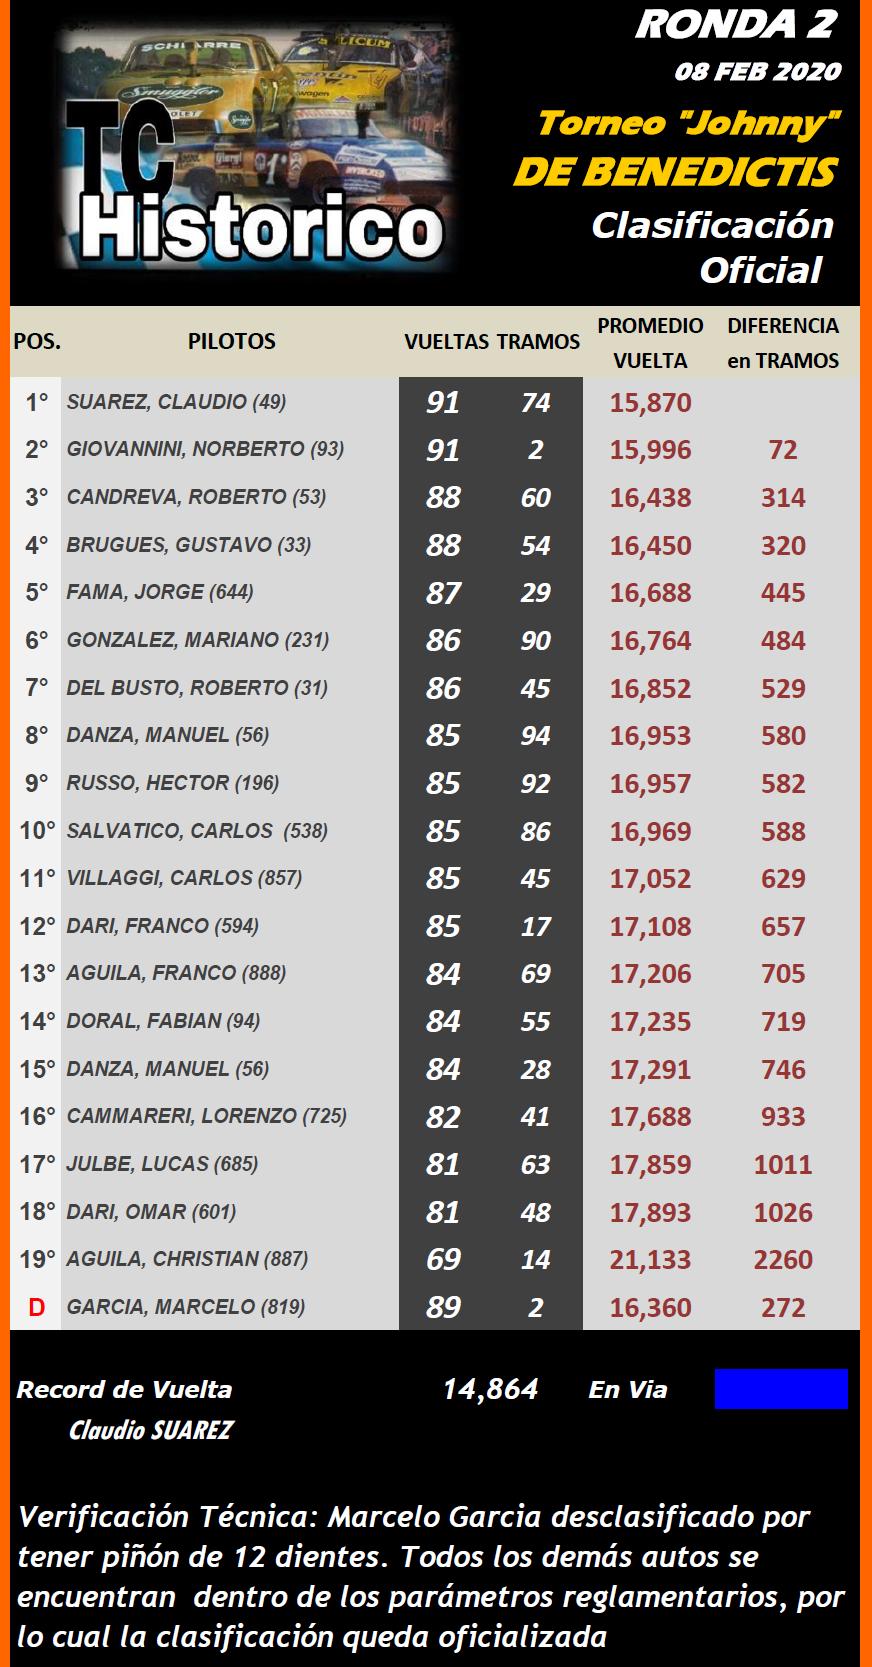 "TC Histórico Torneo ""Johnny"" De Benedictis ▬ 2° Ronda ▬ V. TÉCNICA ▬ CLASIFICACIÓN Tch-r28"